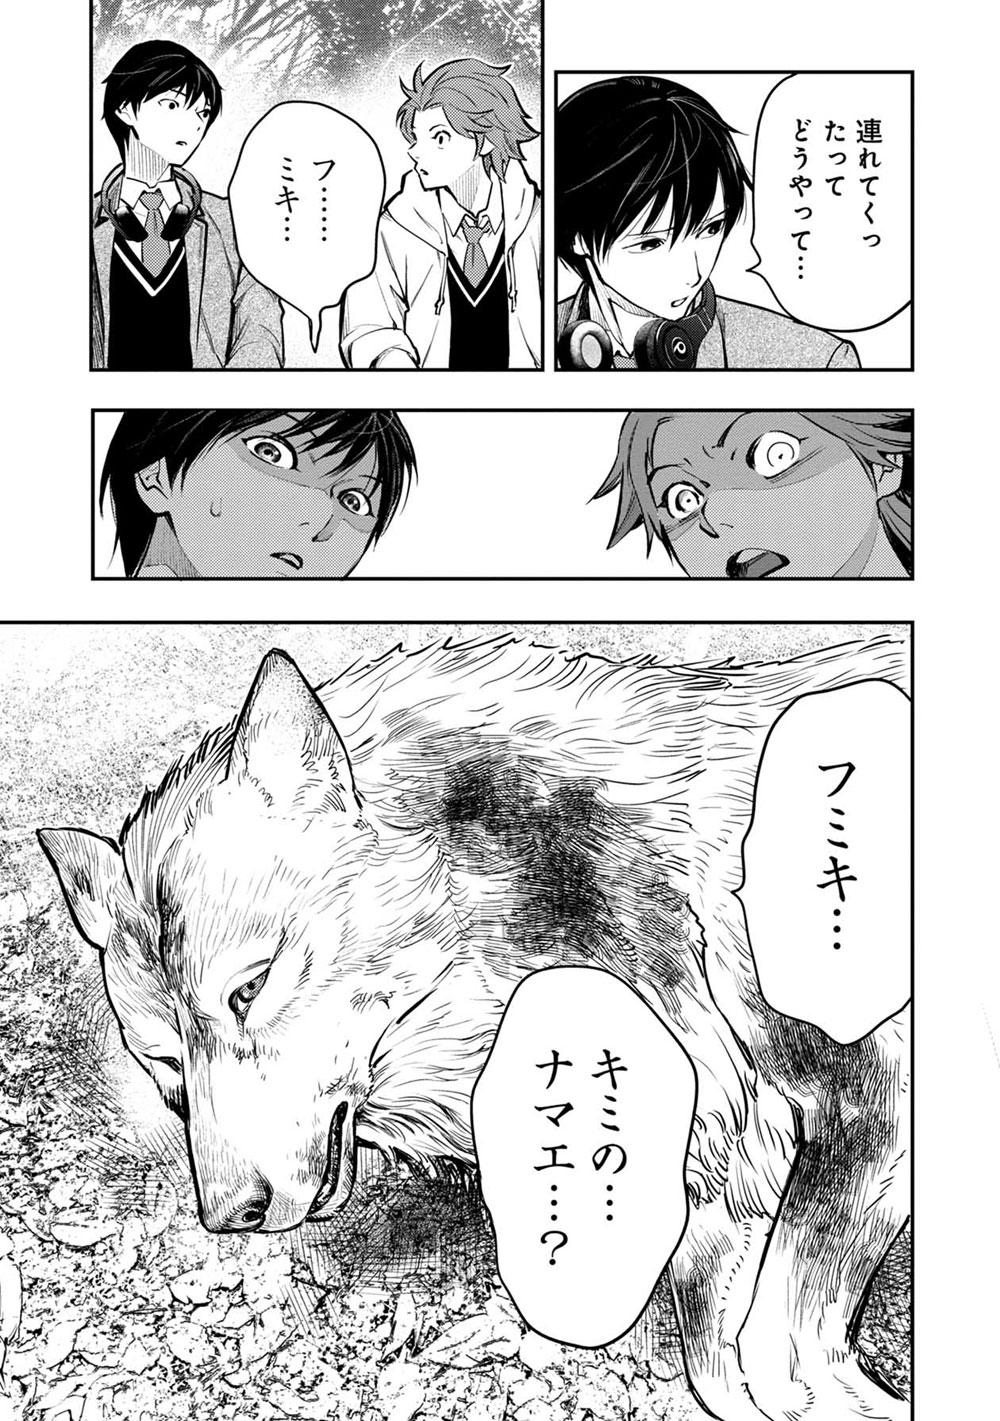 inugami_re_002_016.jpg